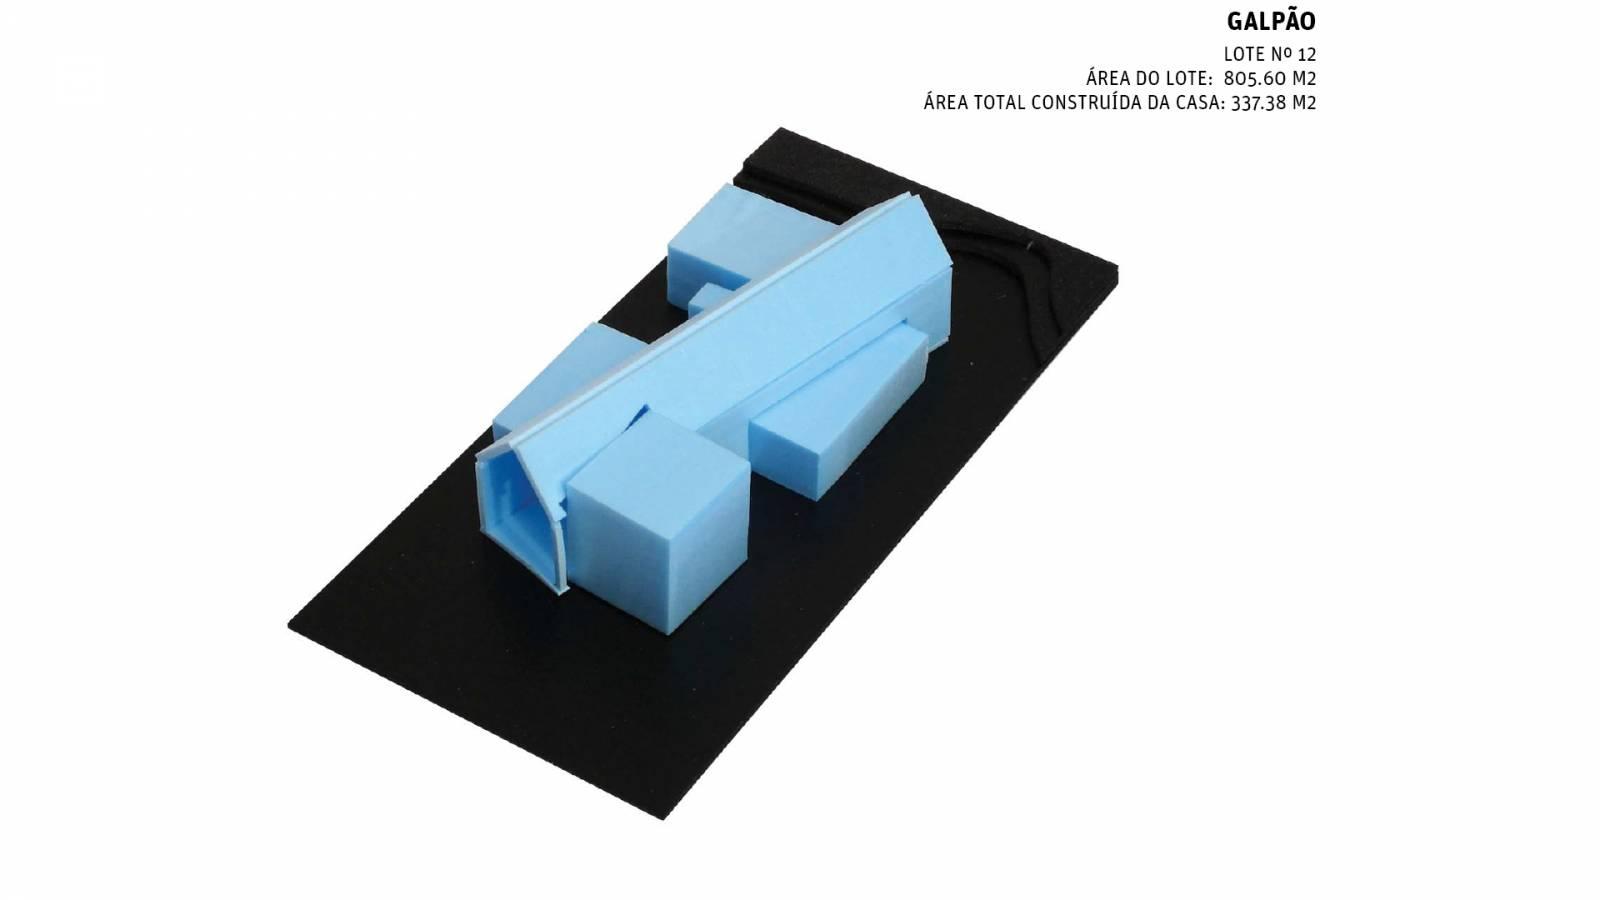 HOUSE #4 - BARN BUILDING - 6 case study houses - SPOL Architects